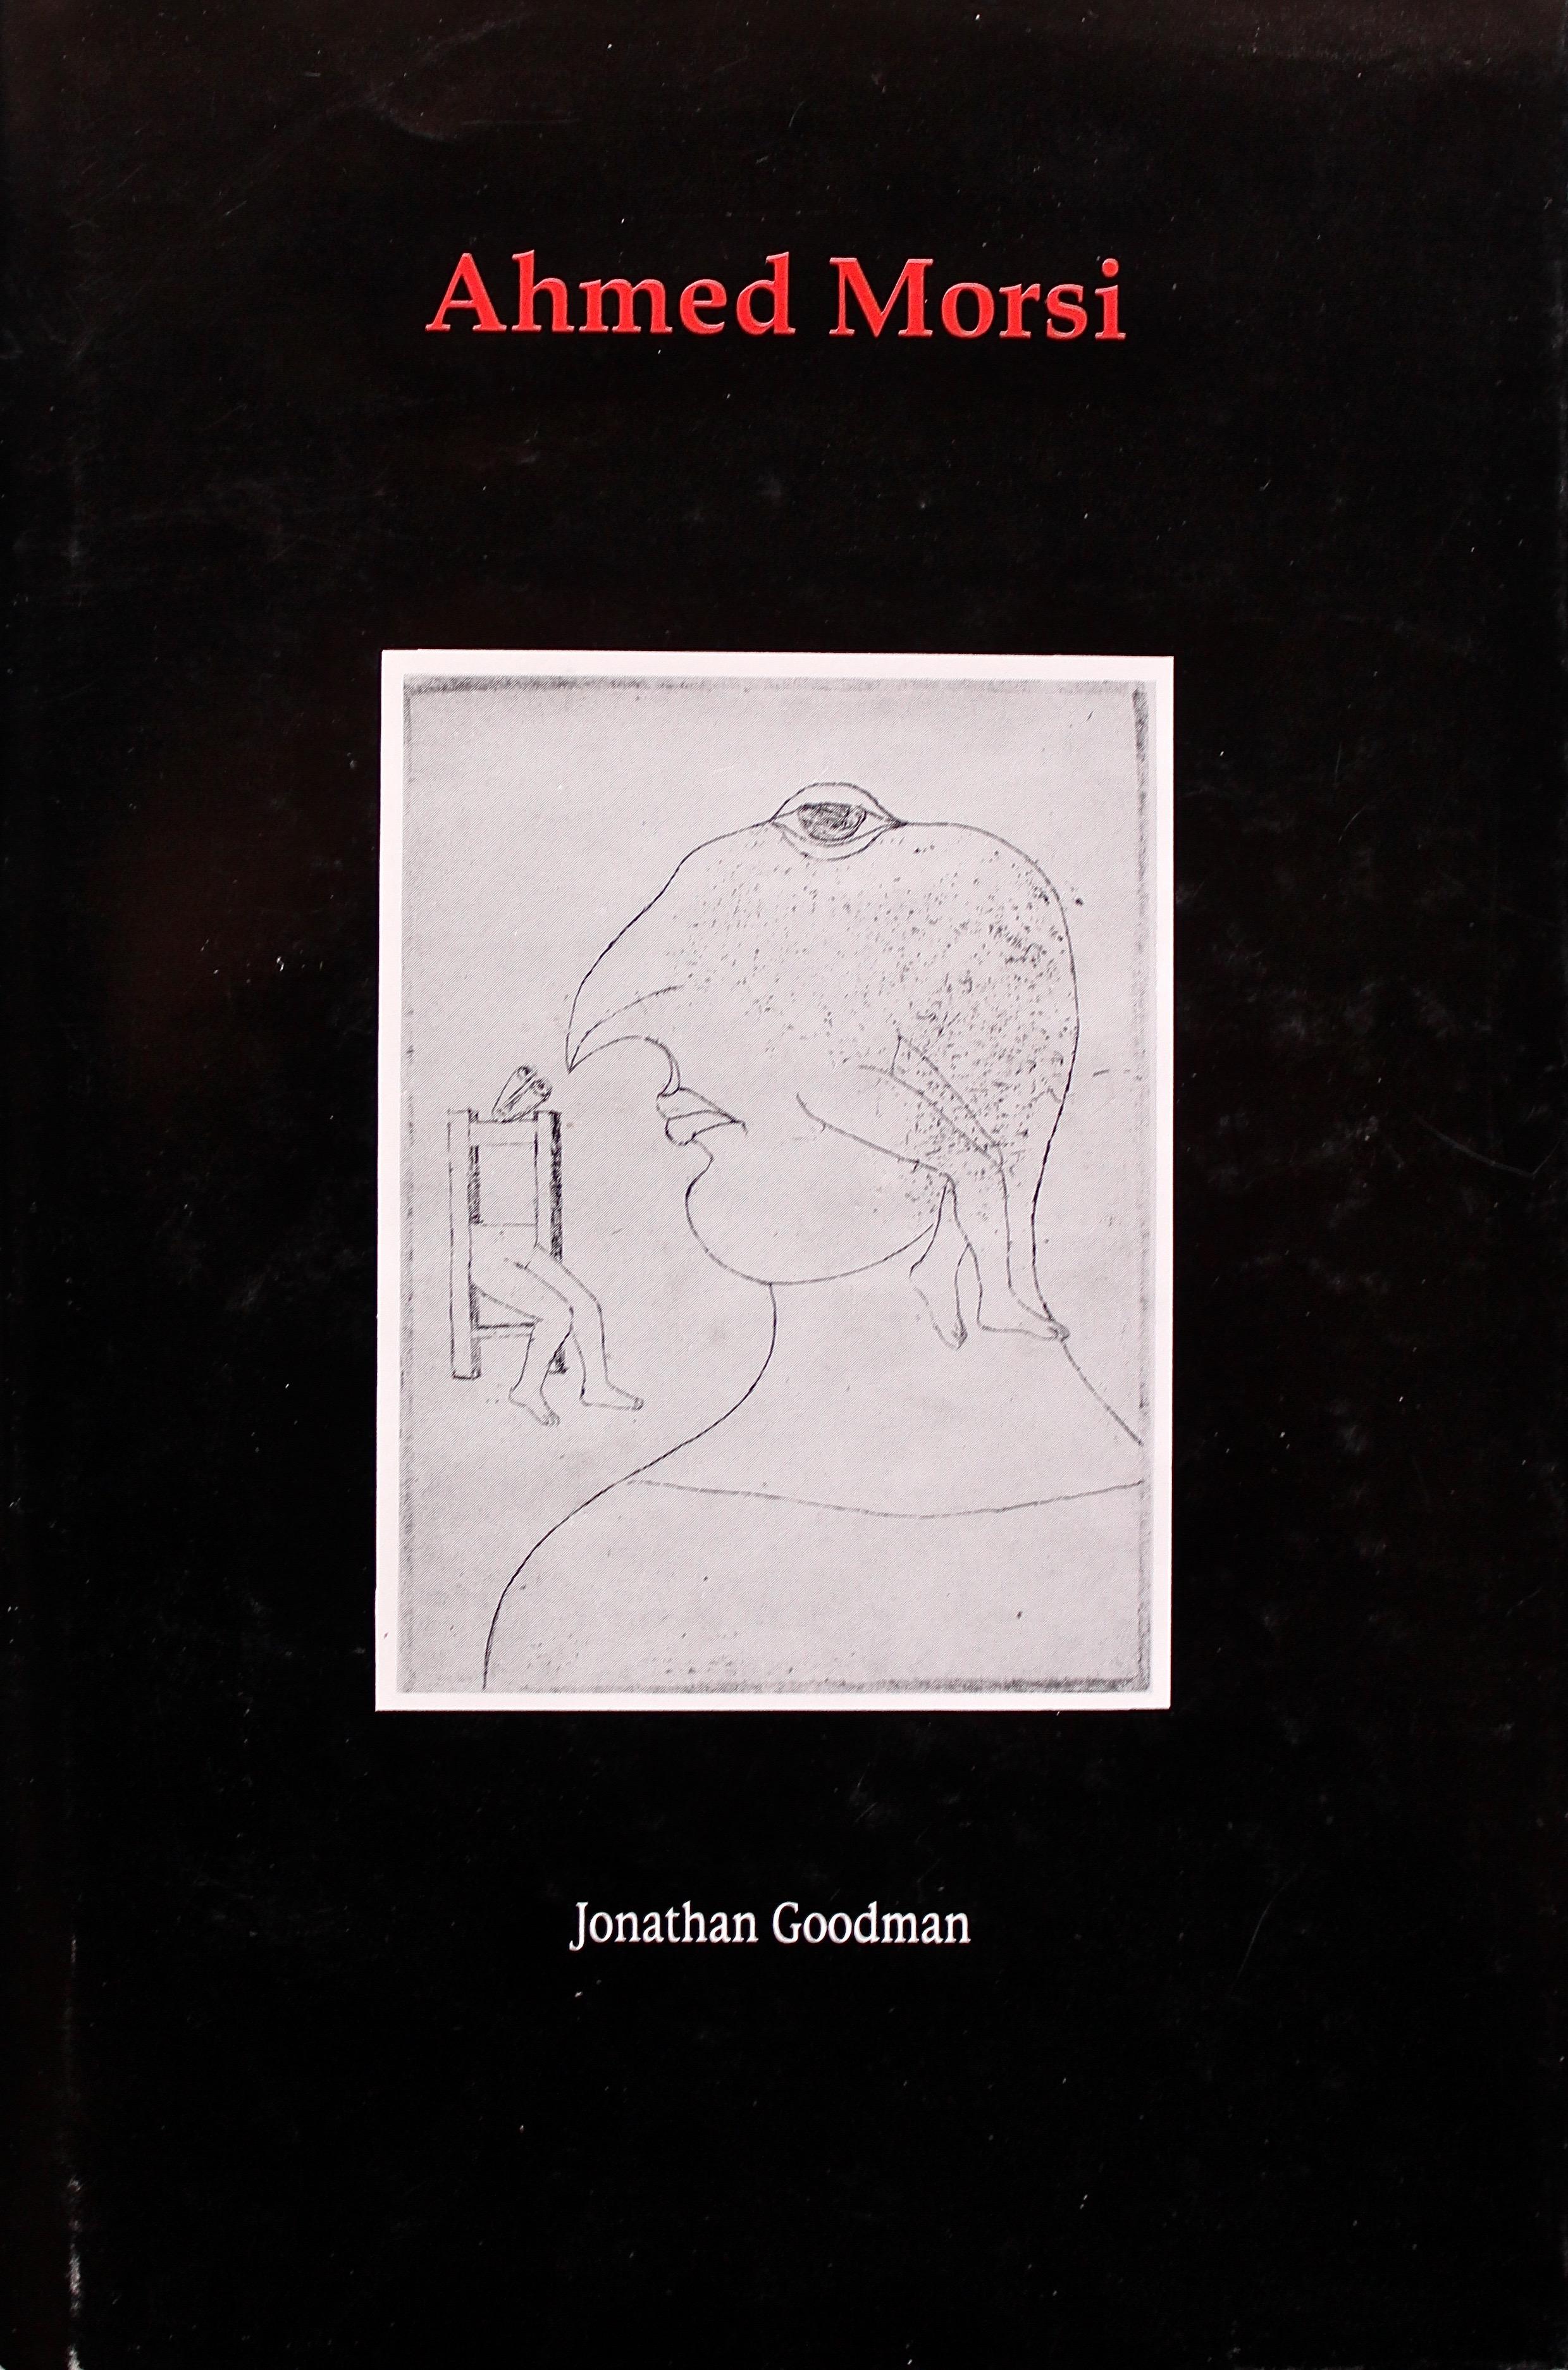 Introduction by Jonathan Goodman